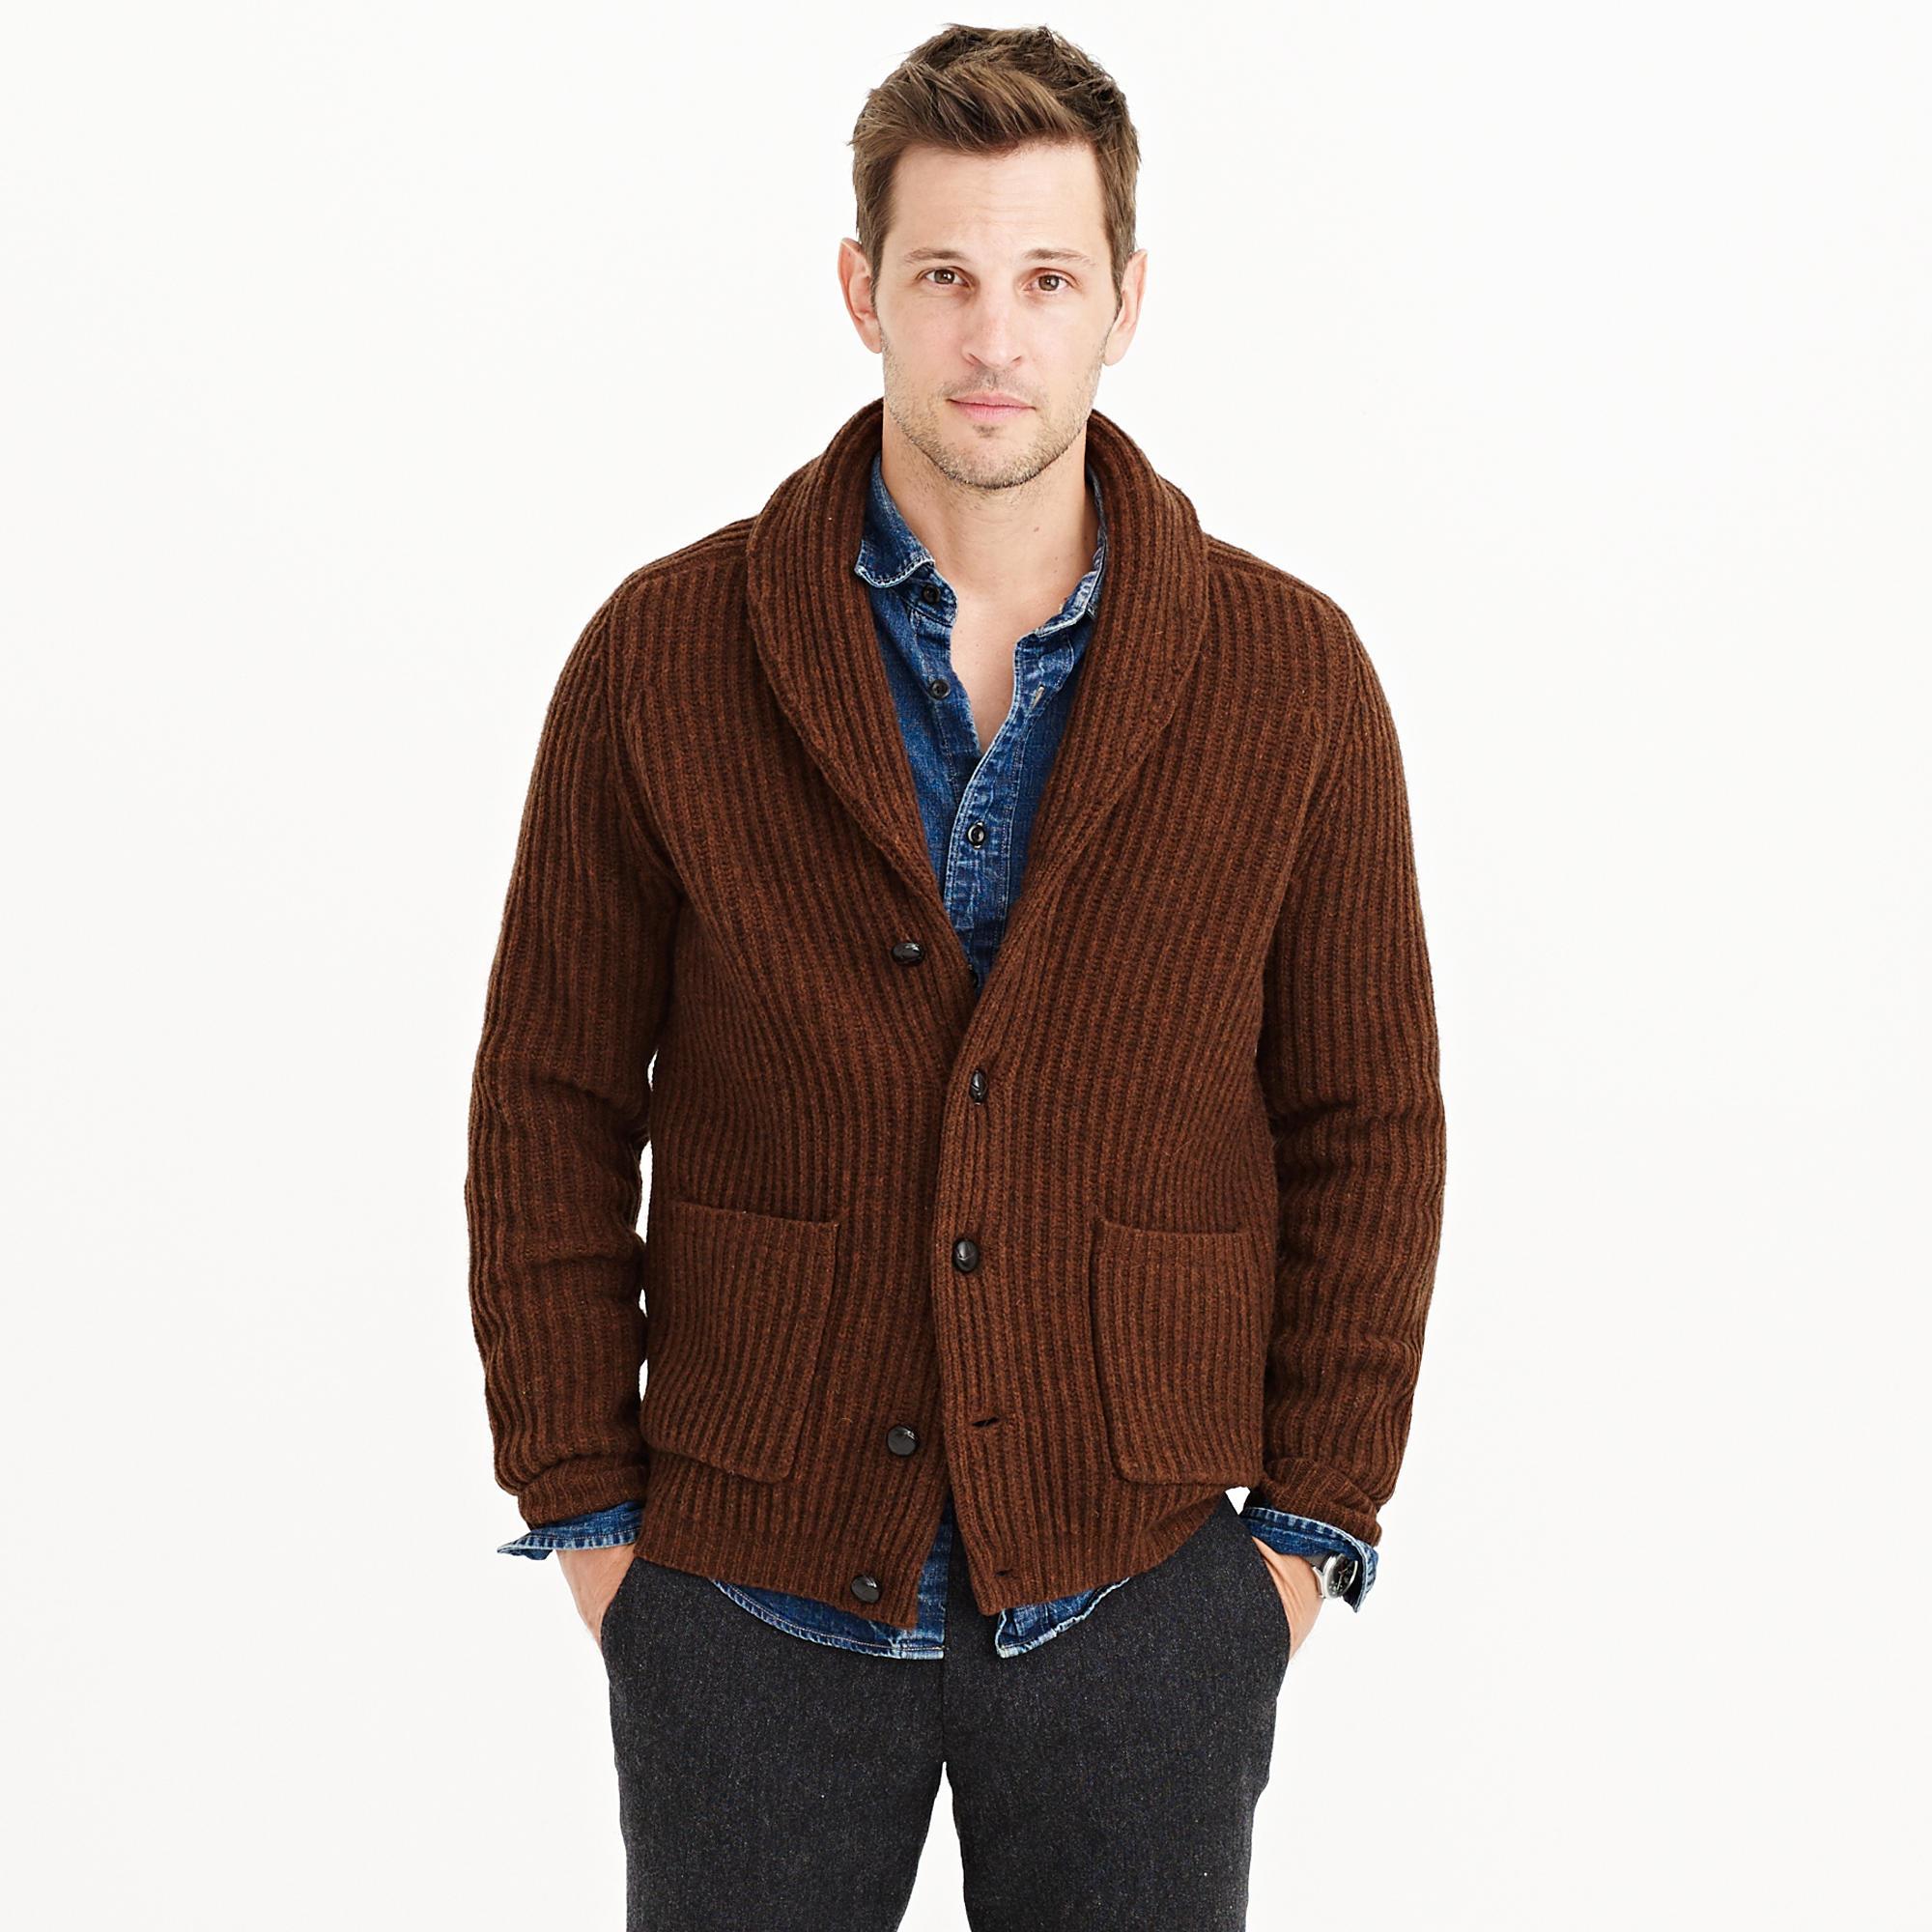 J.crew Lambswool Ribbed Cardigan Sweater in Brown for Men   Lyst